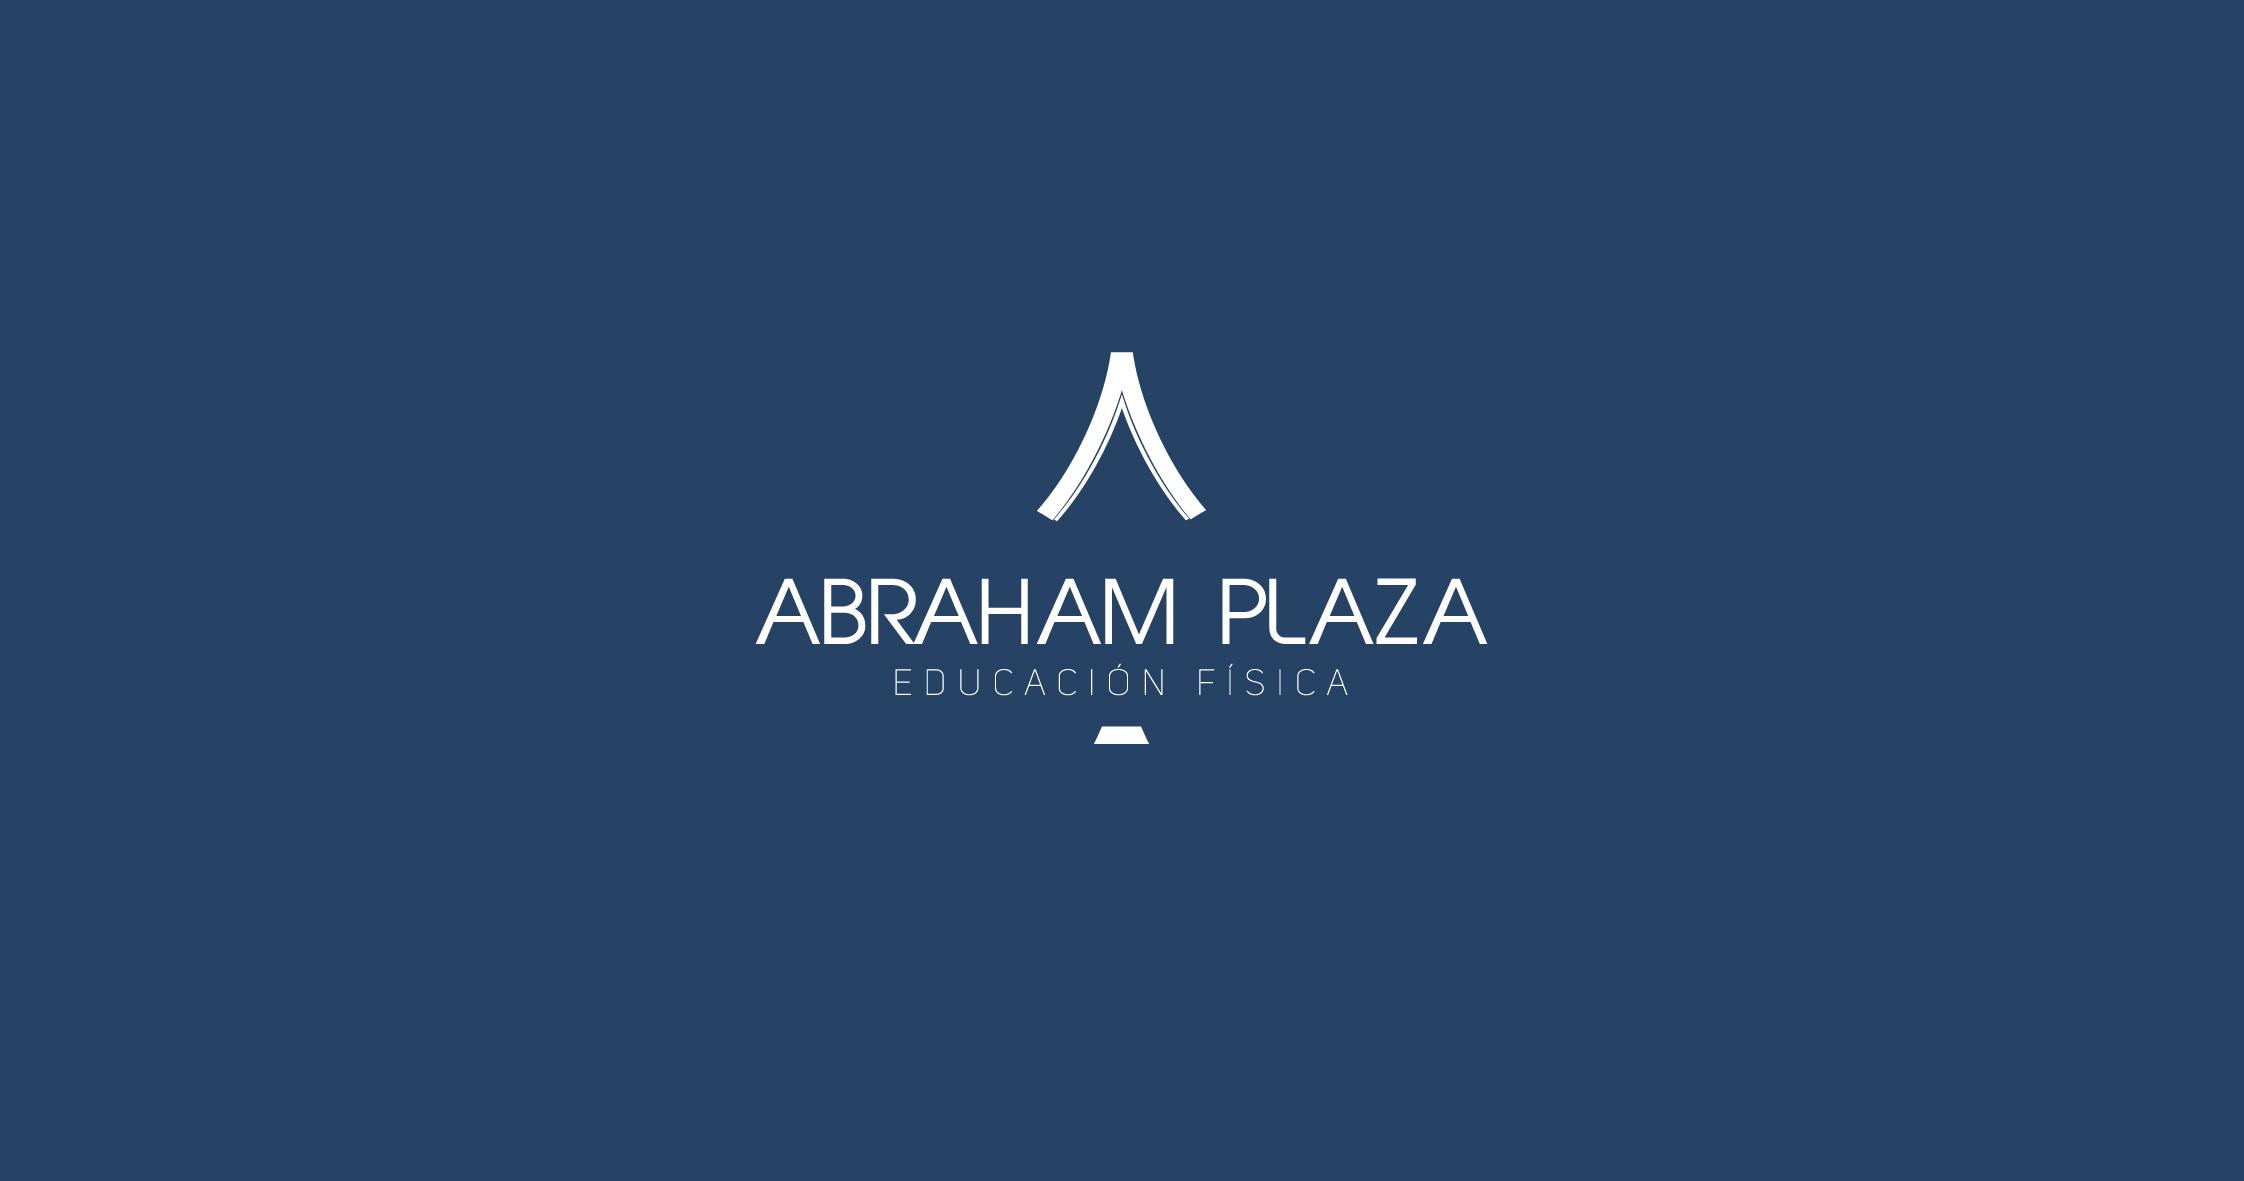 Abraham Plaza Imagen Corporativa